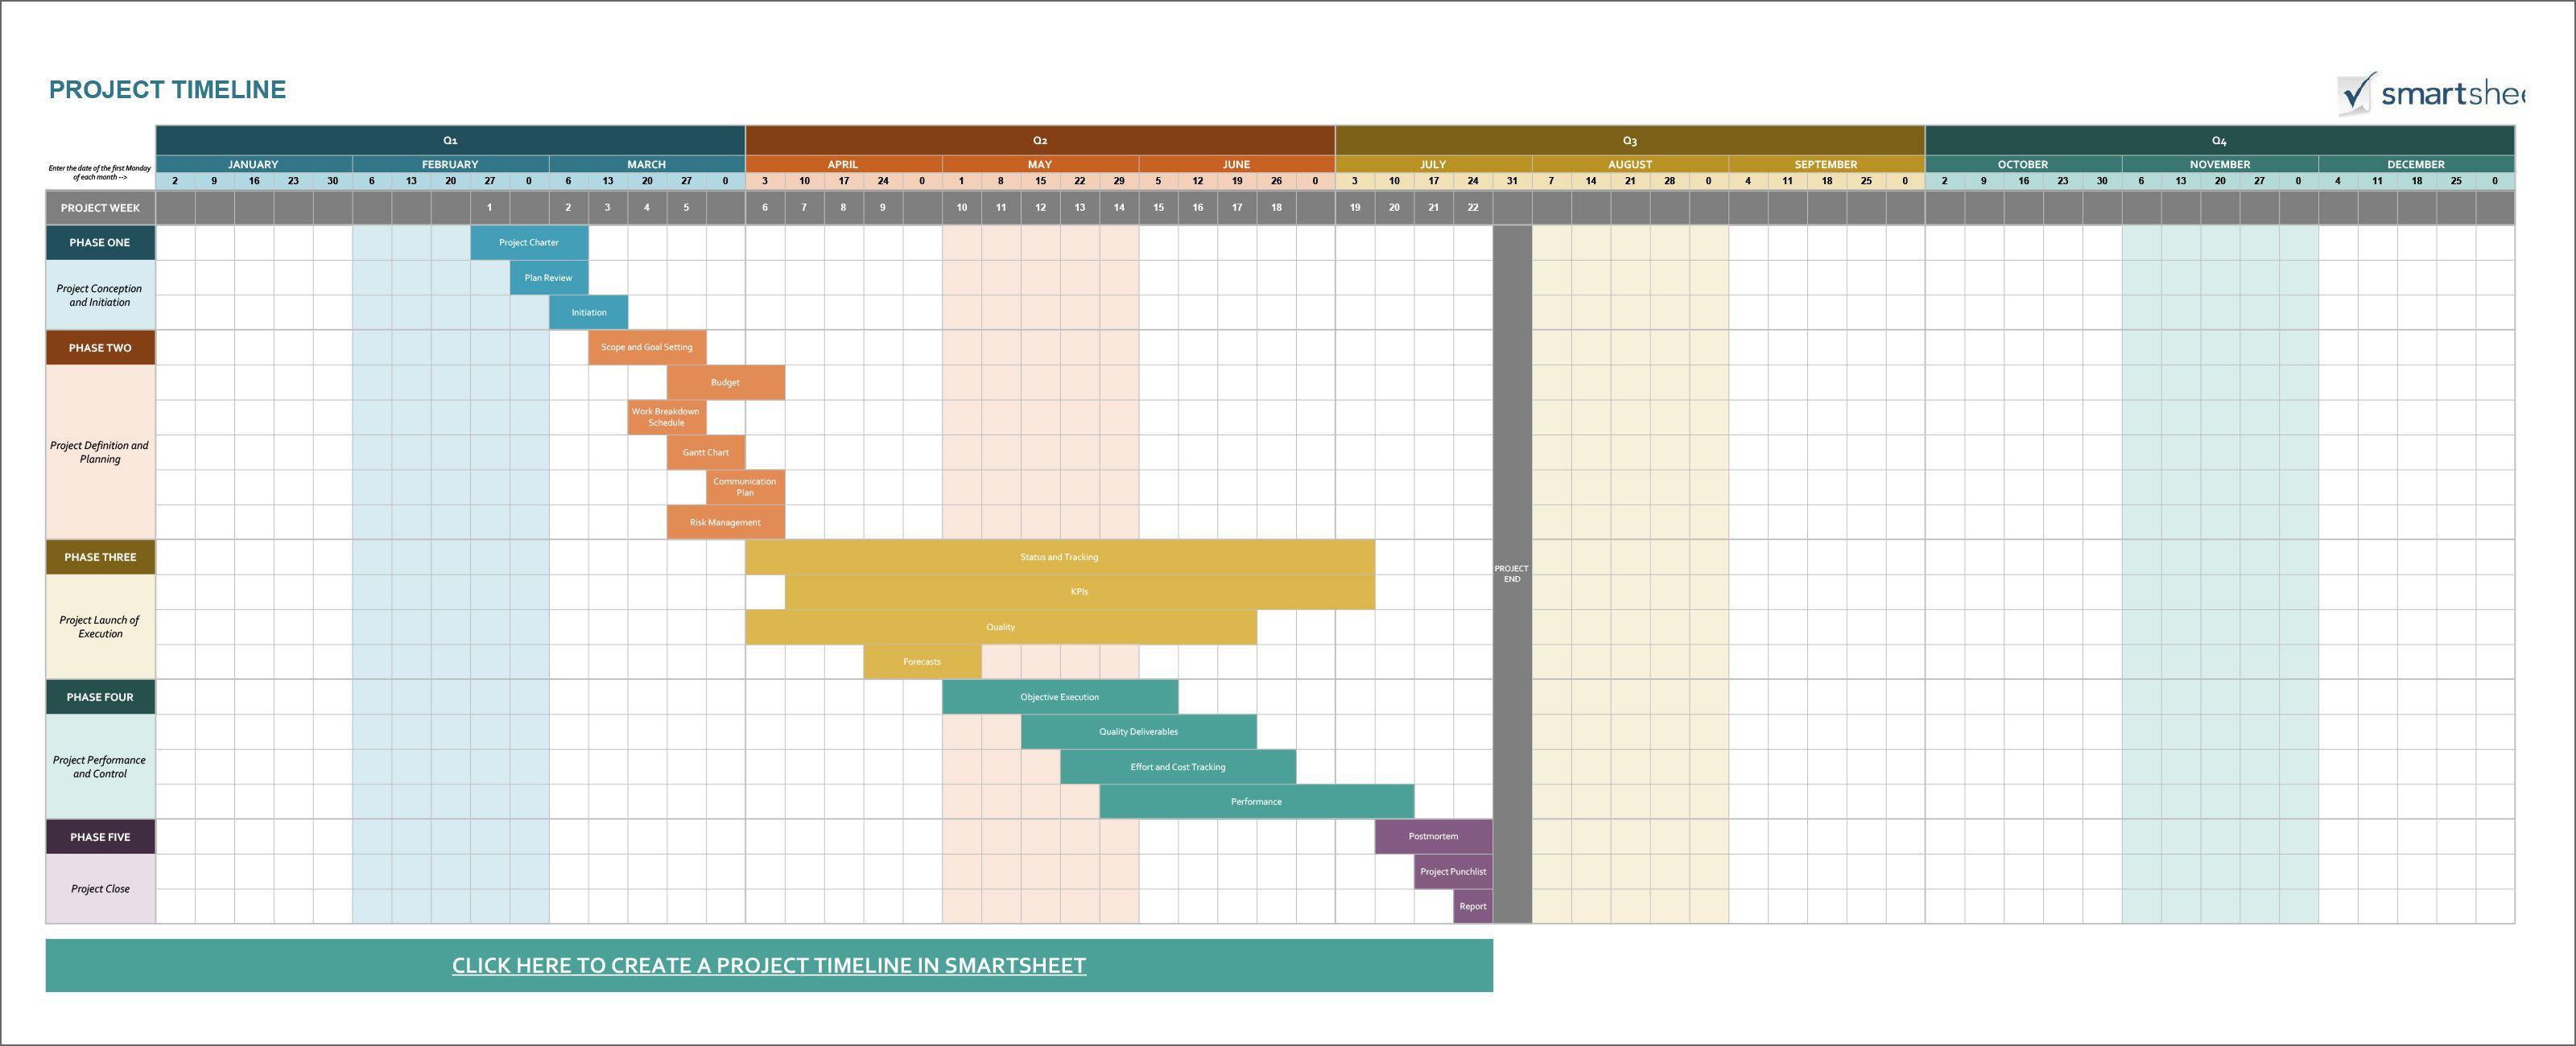 003 Impressive Microsoft Excel Timeline Template Idea  Templates Project Free DownloadFull